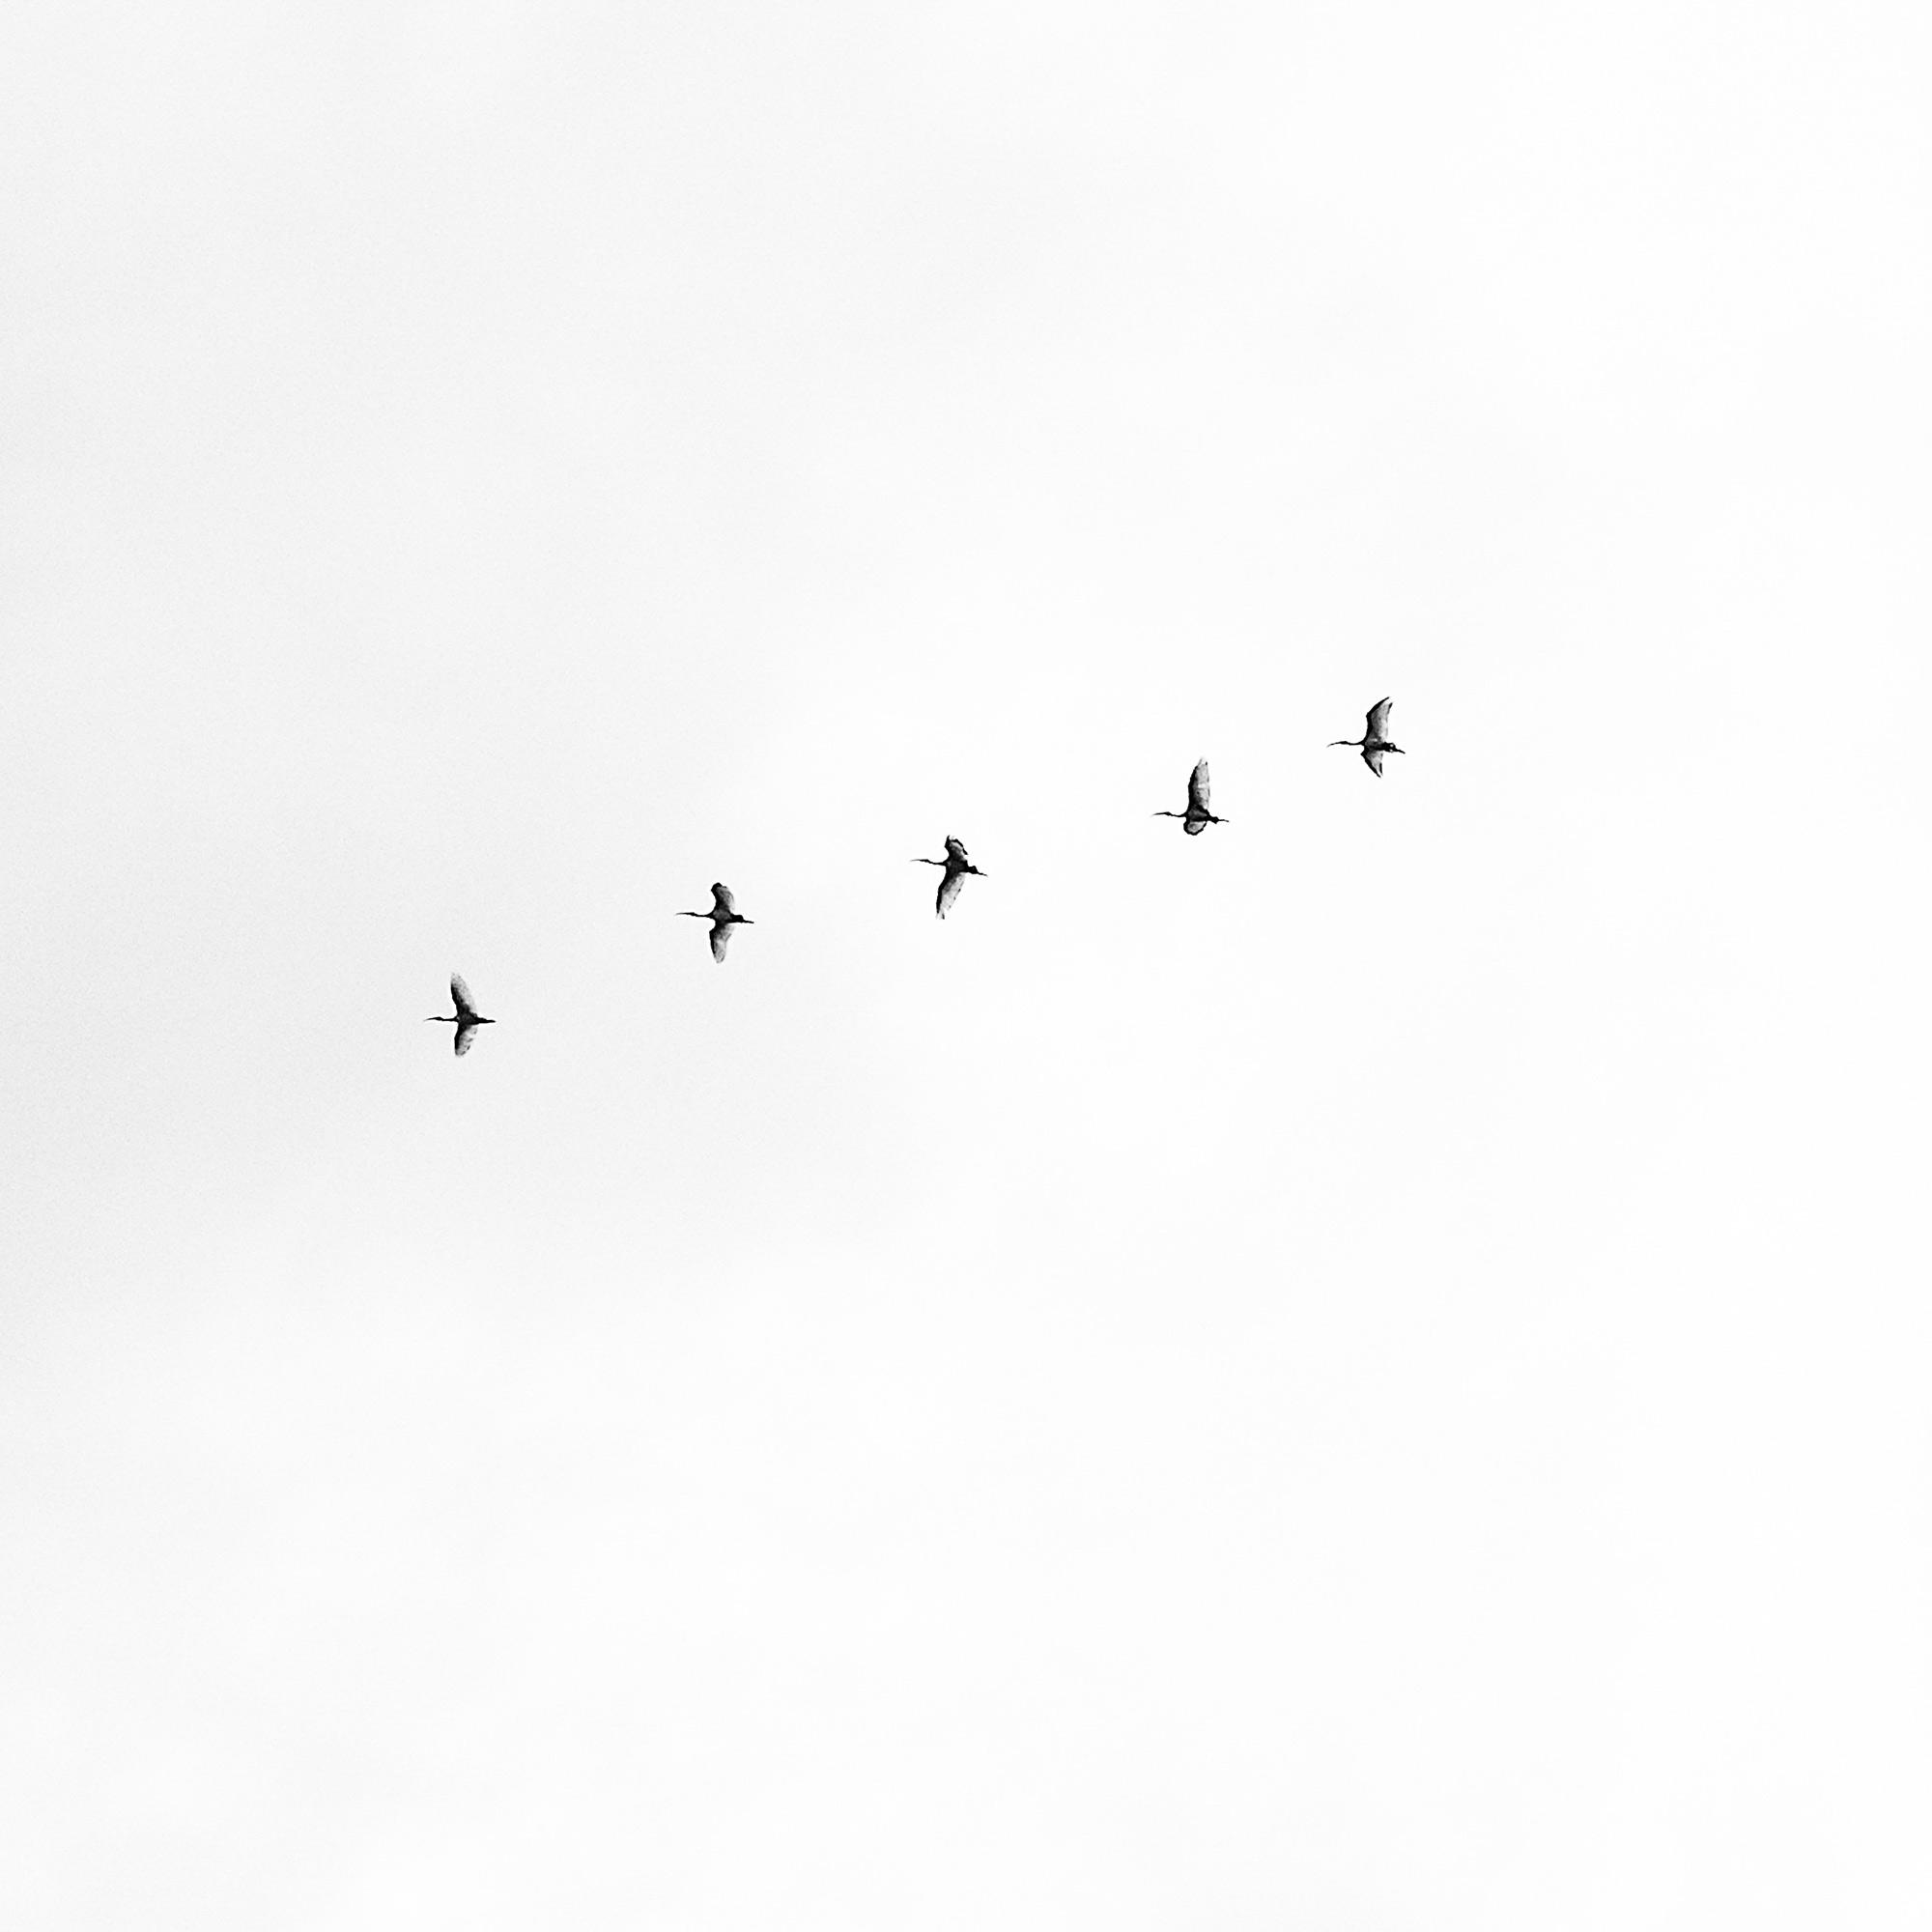 4 minimal-unsplash-photo-birds-in-flight.jpg